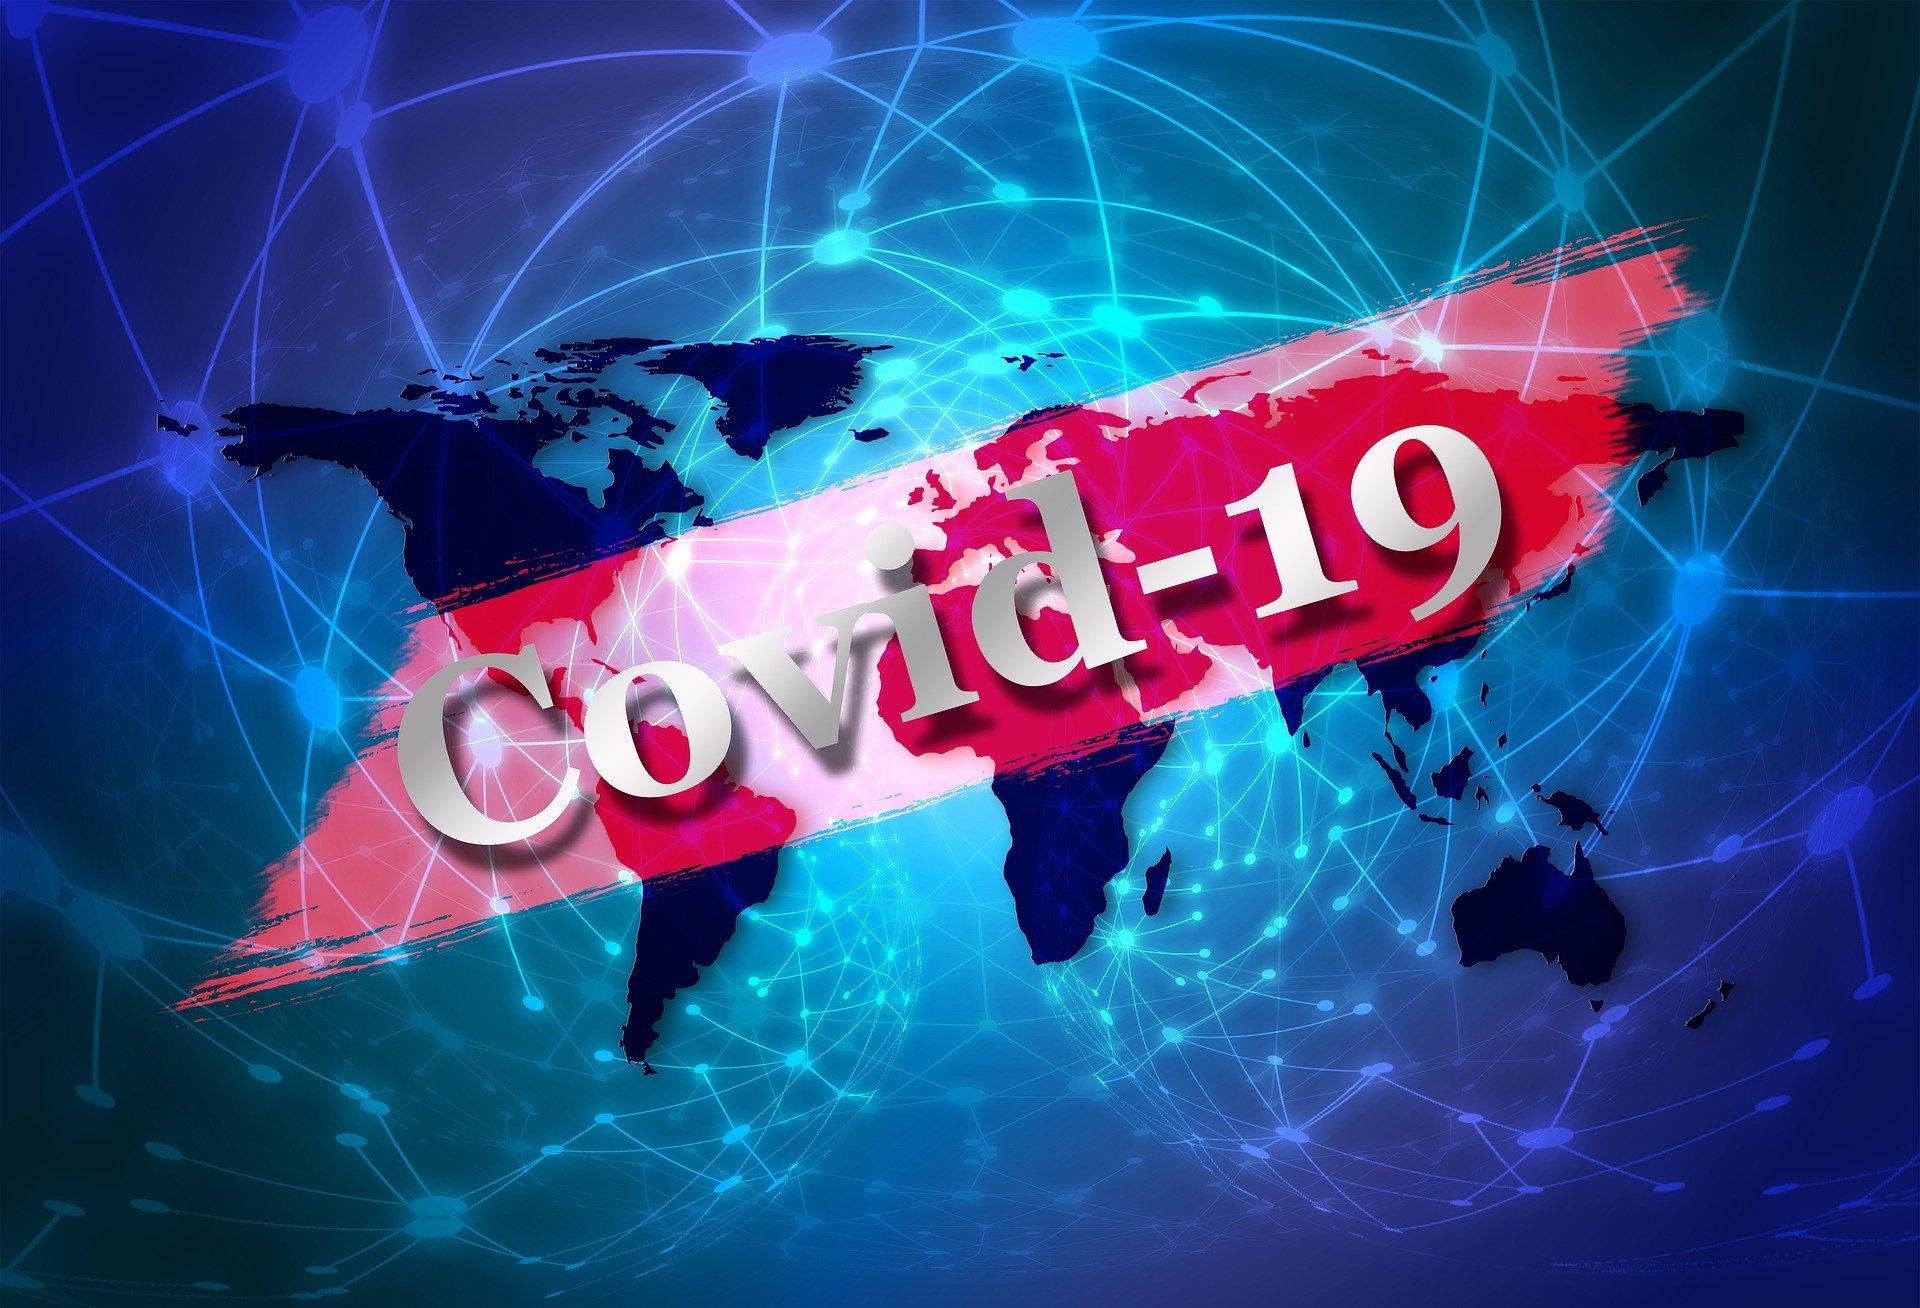 Covid-19: ES deve chegar a quase 250 mortes na próxima semana | A ...